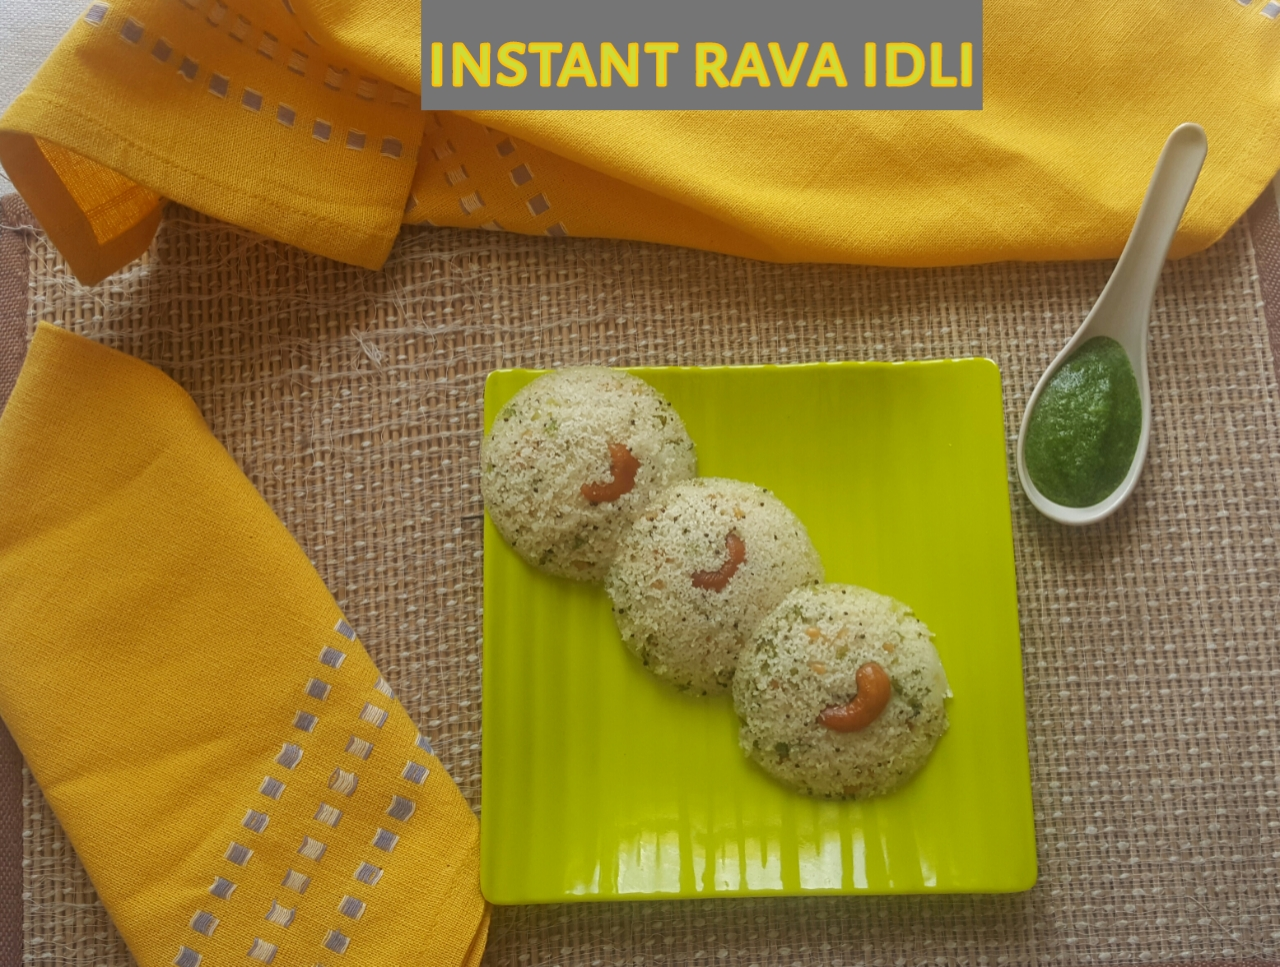 INSTANT RAVA IDLI